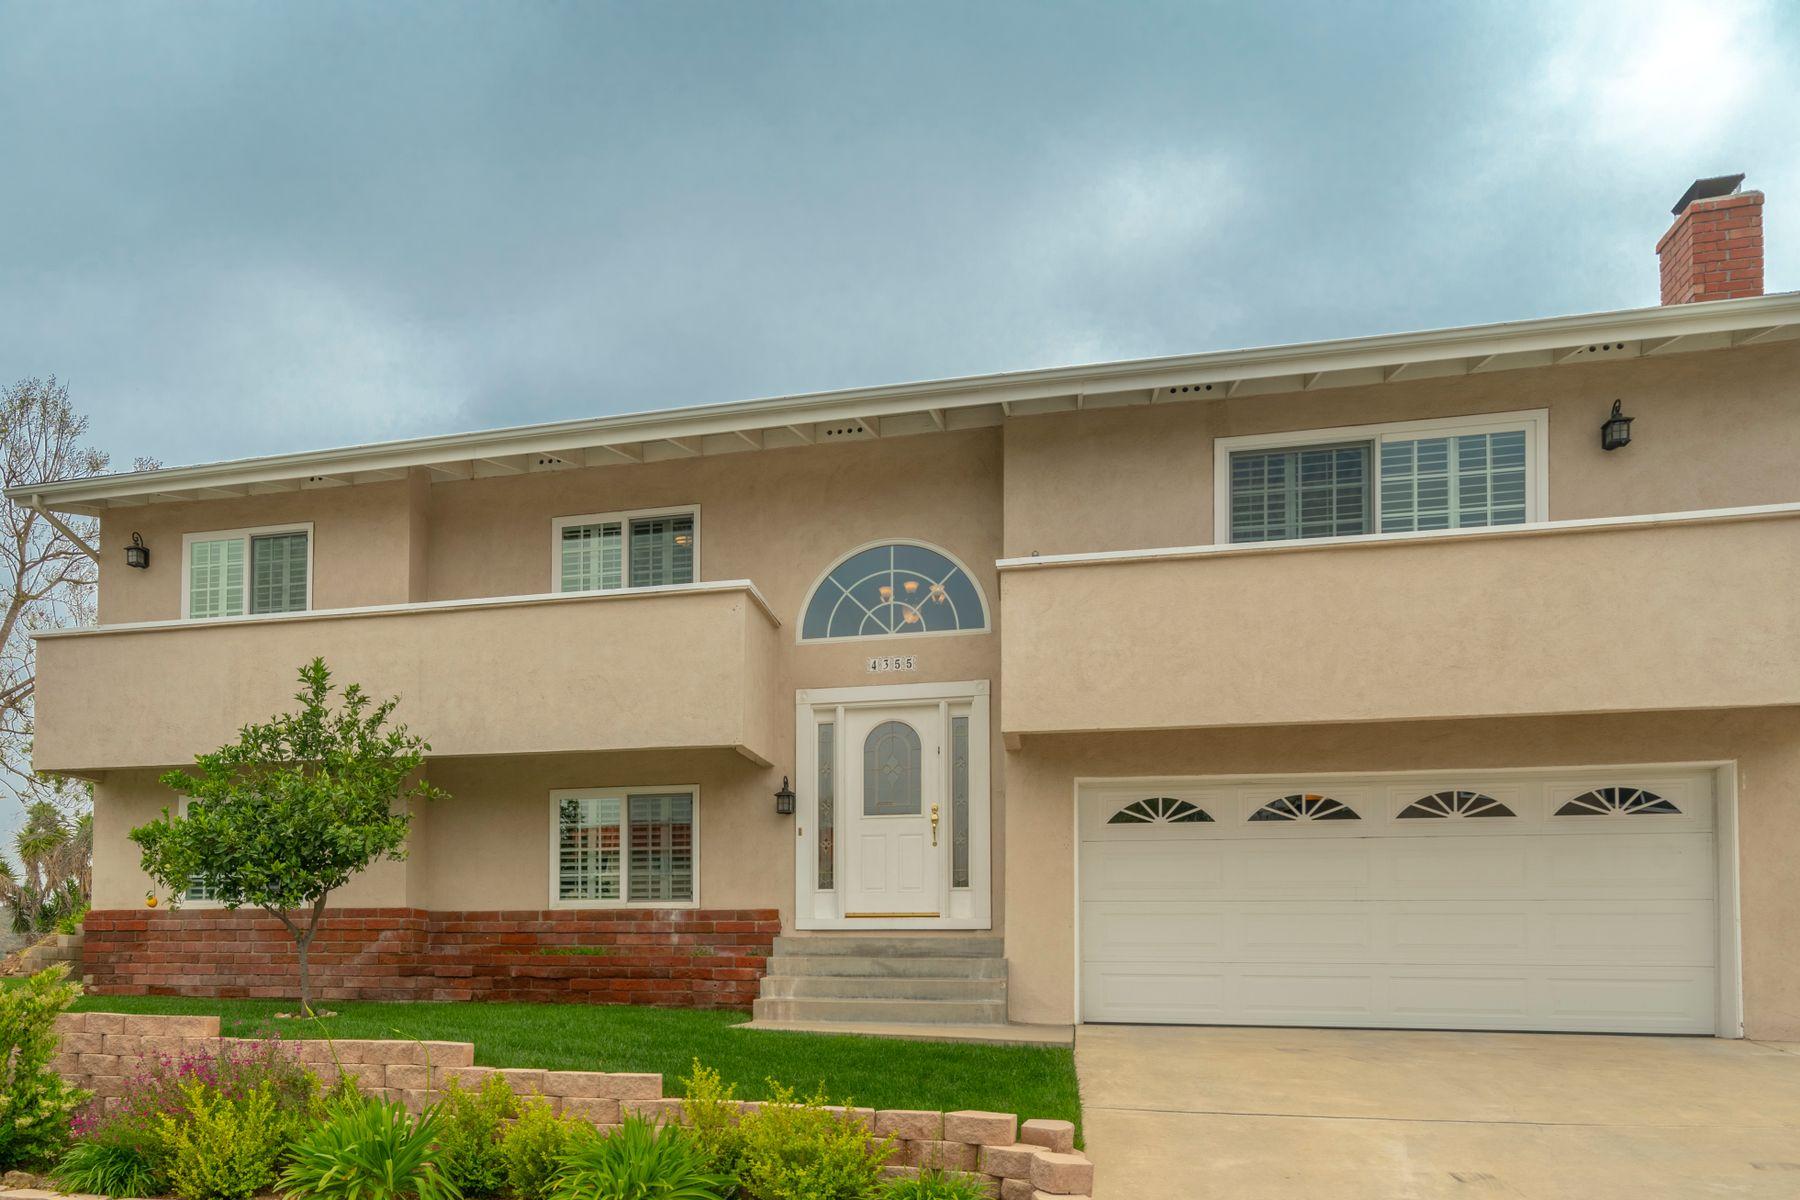 Single Family Homes for Sale at 4355 Avenida Prado Thousand Oaks, California 91360 United States